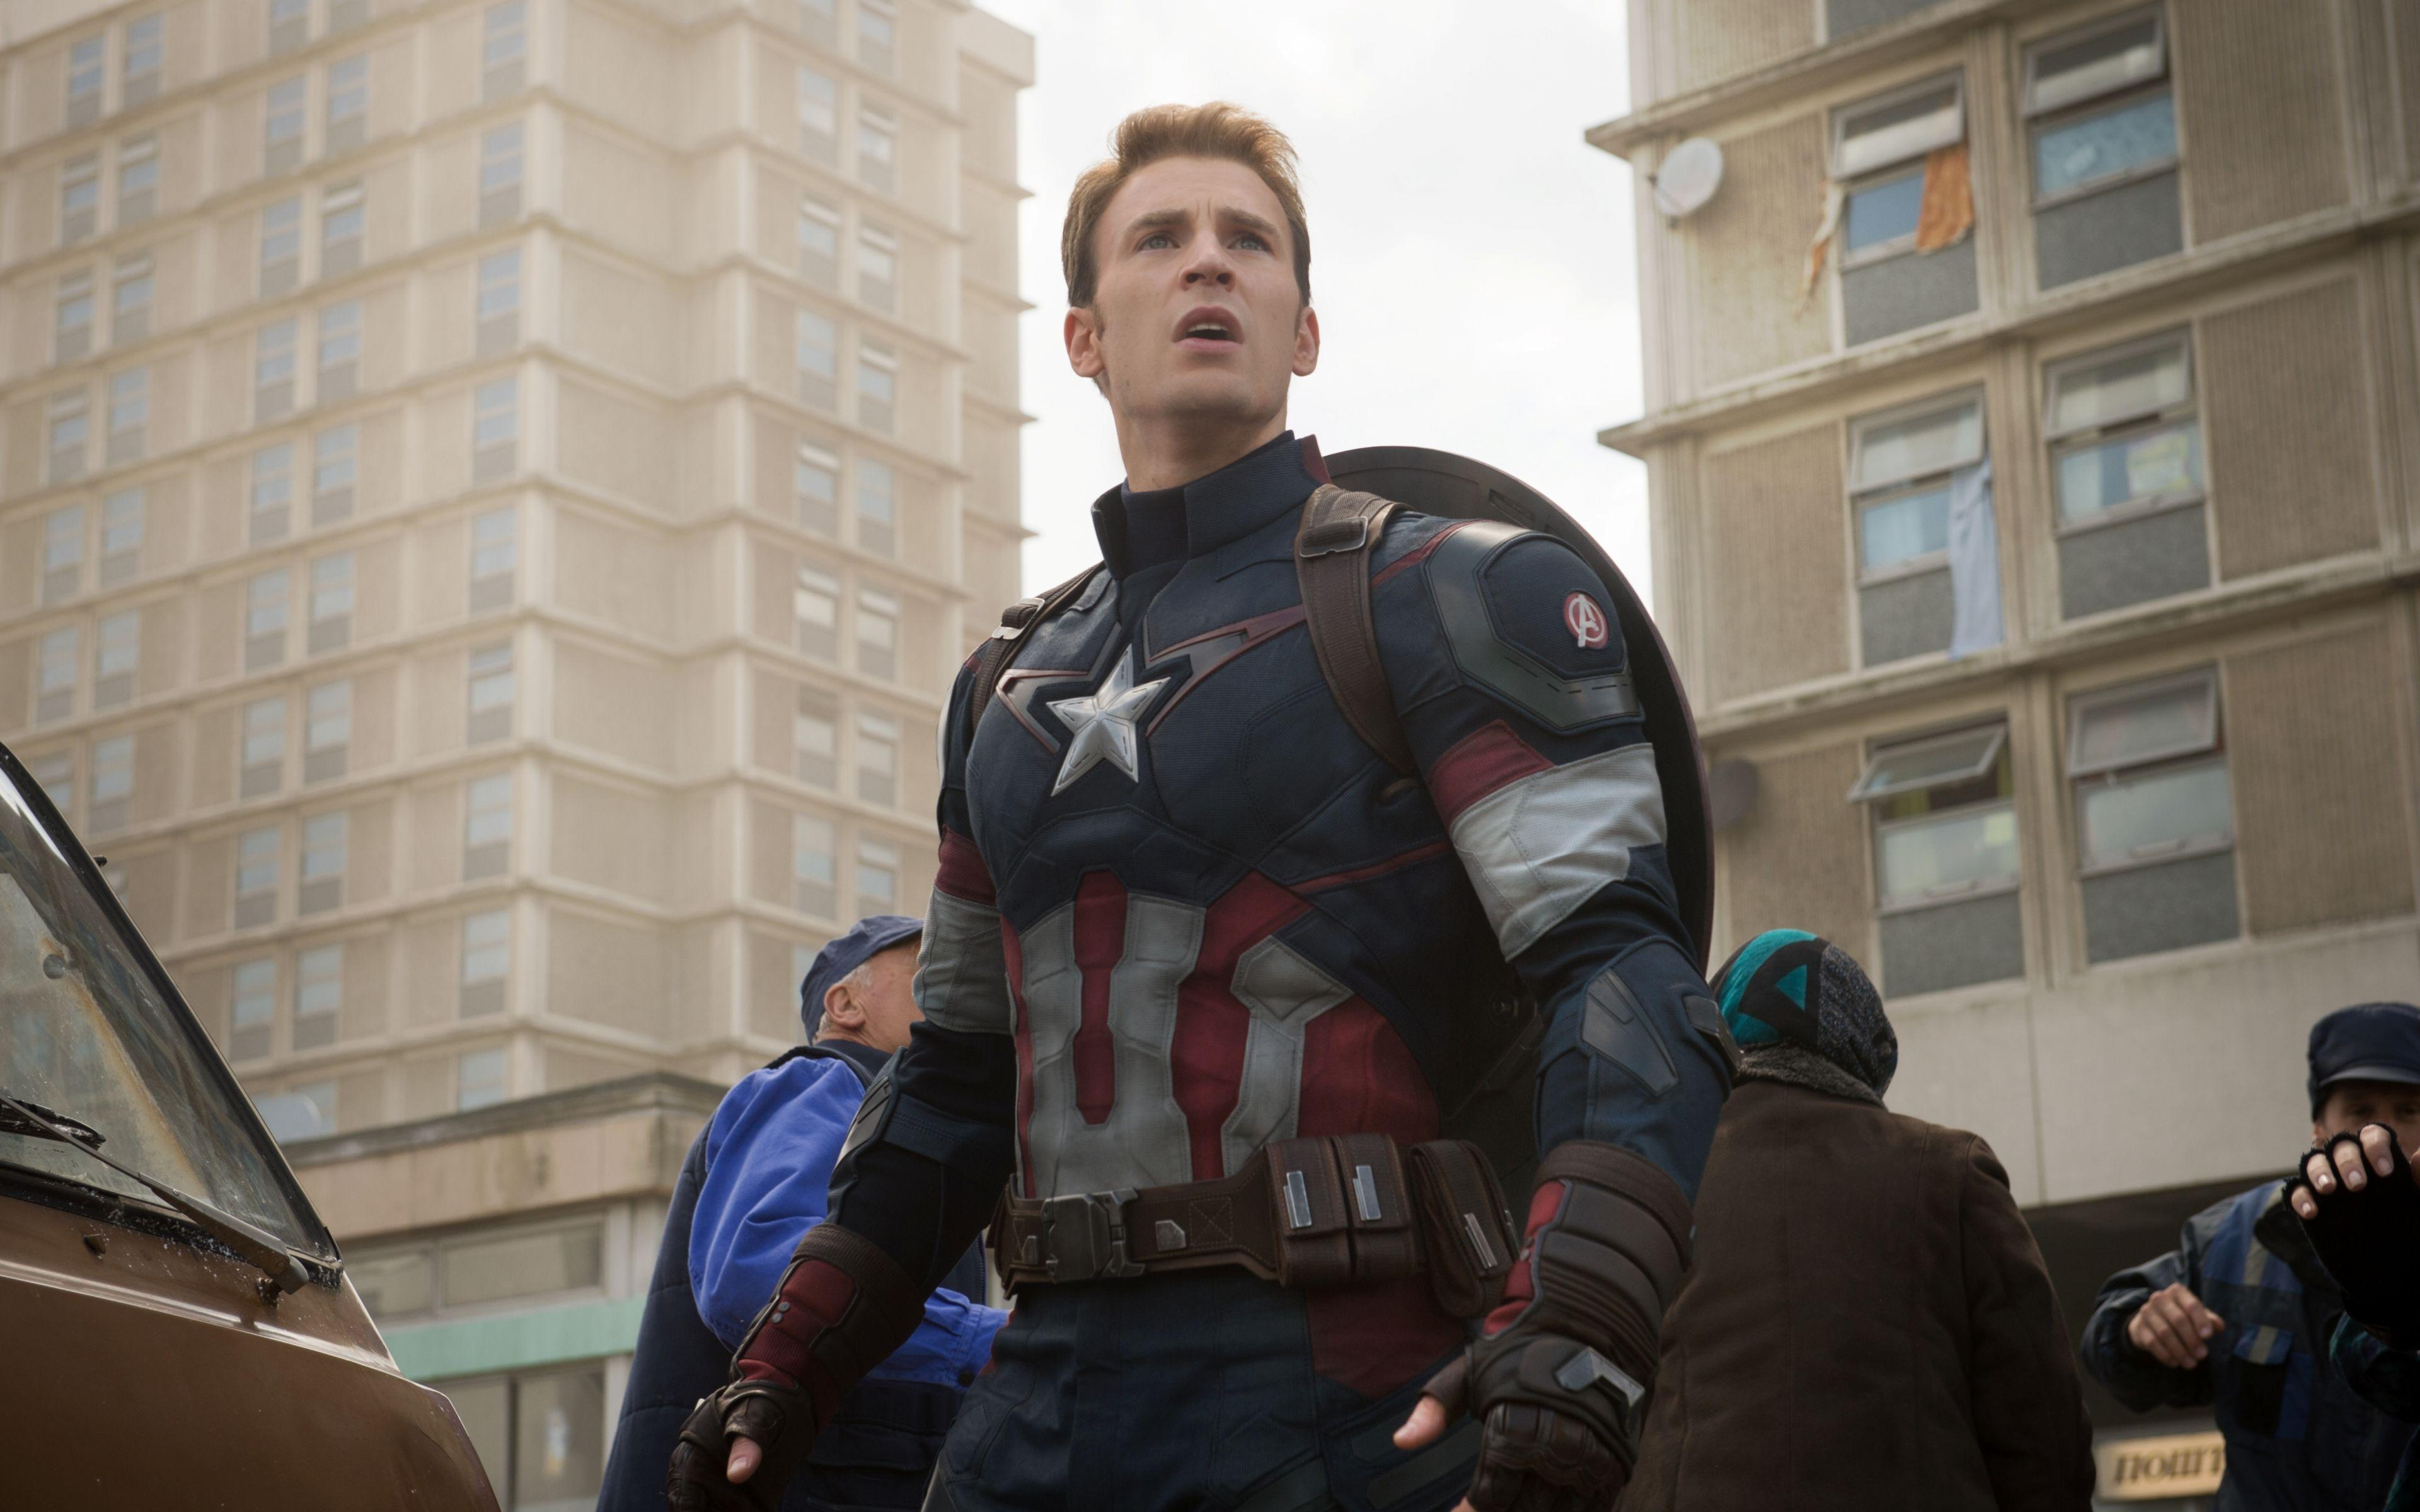 Captain America Wallpaper Chris Evans Wallpaper 1080p : Movie ...